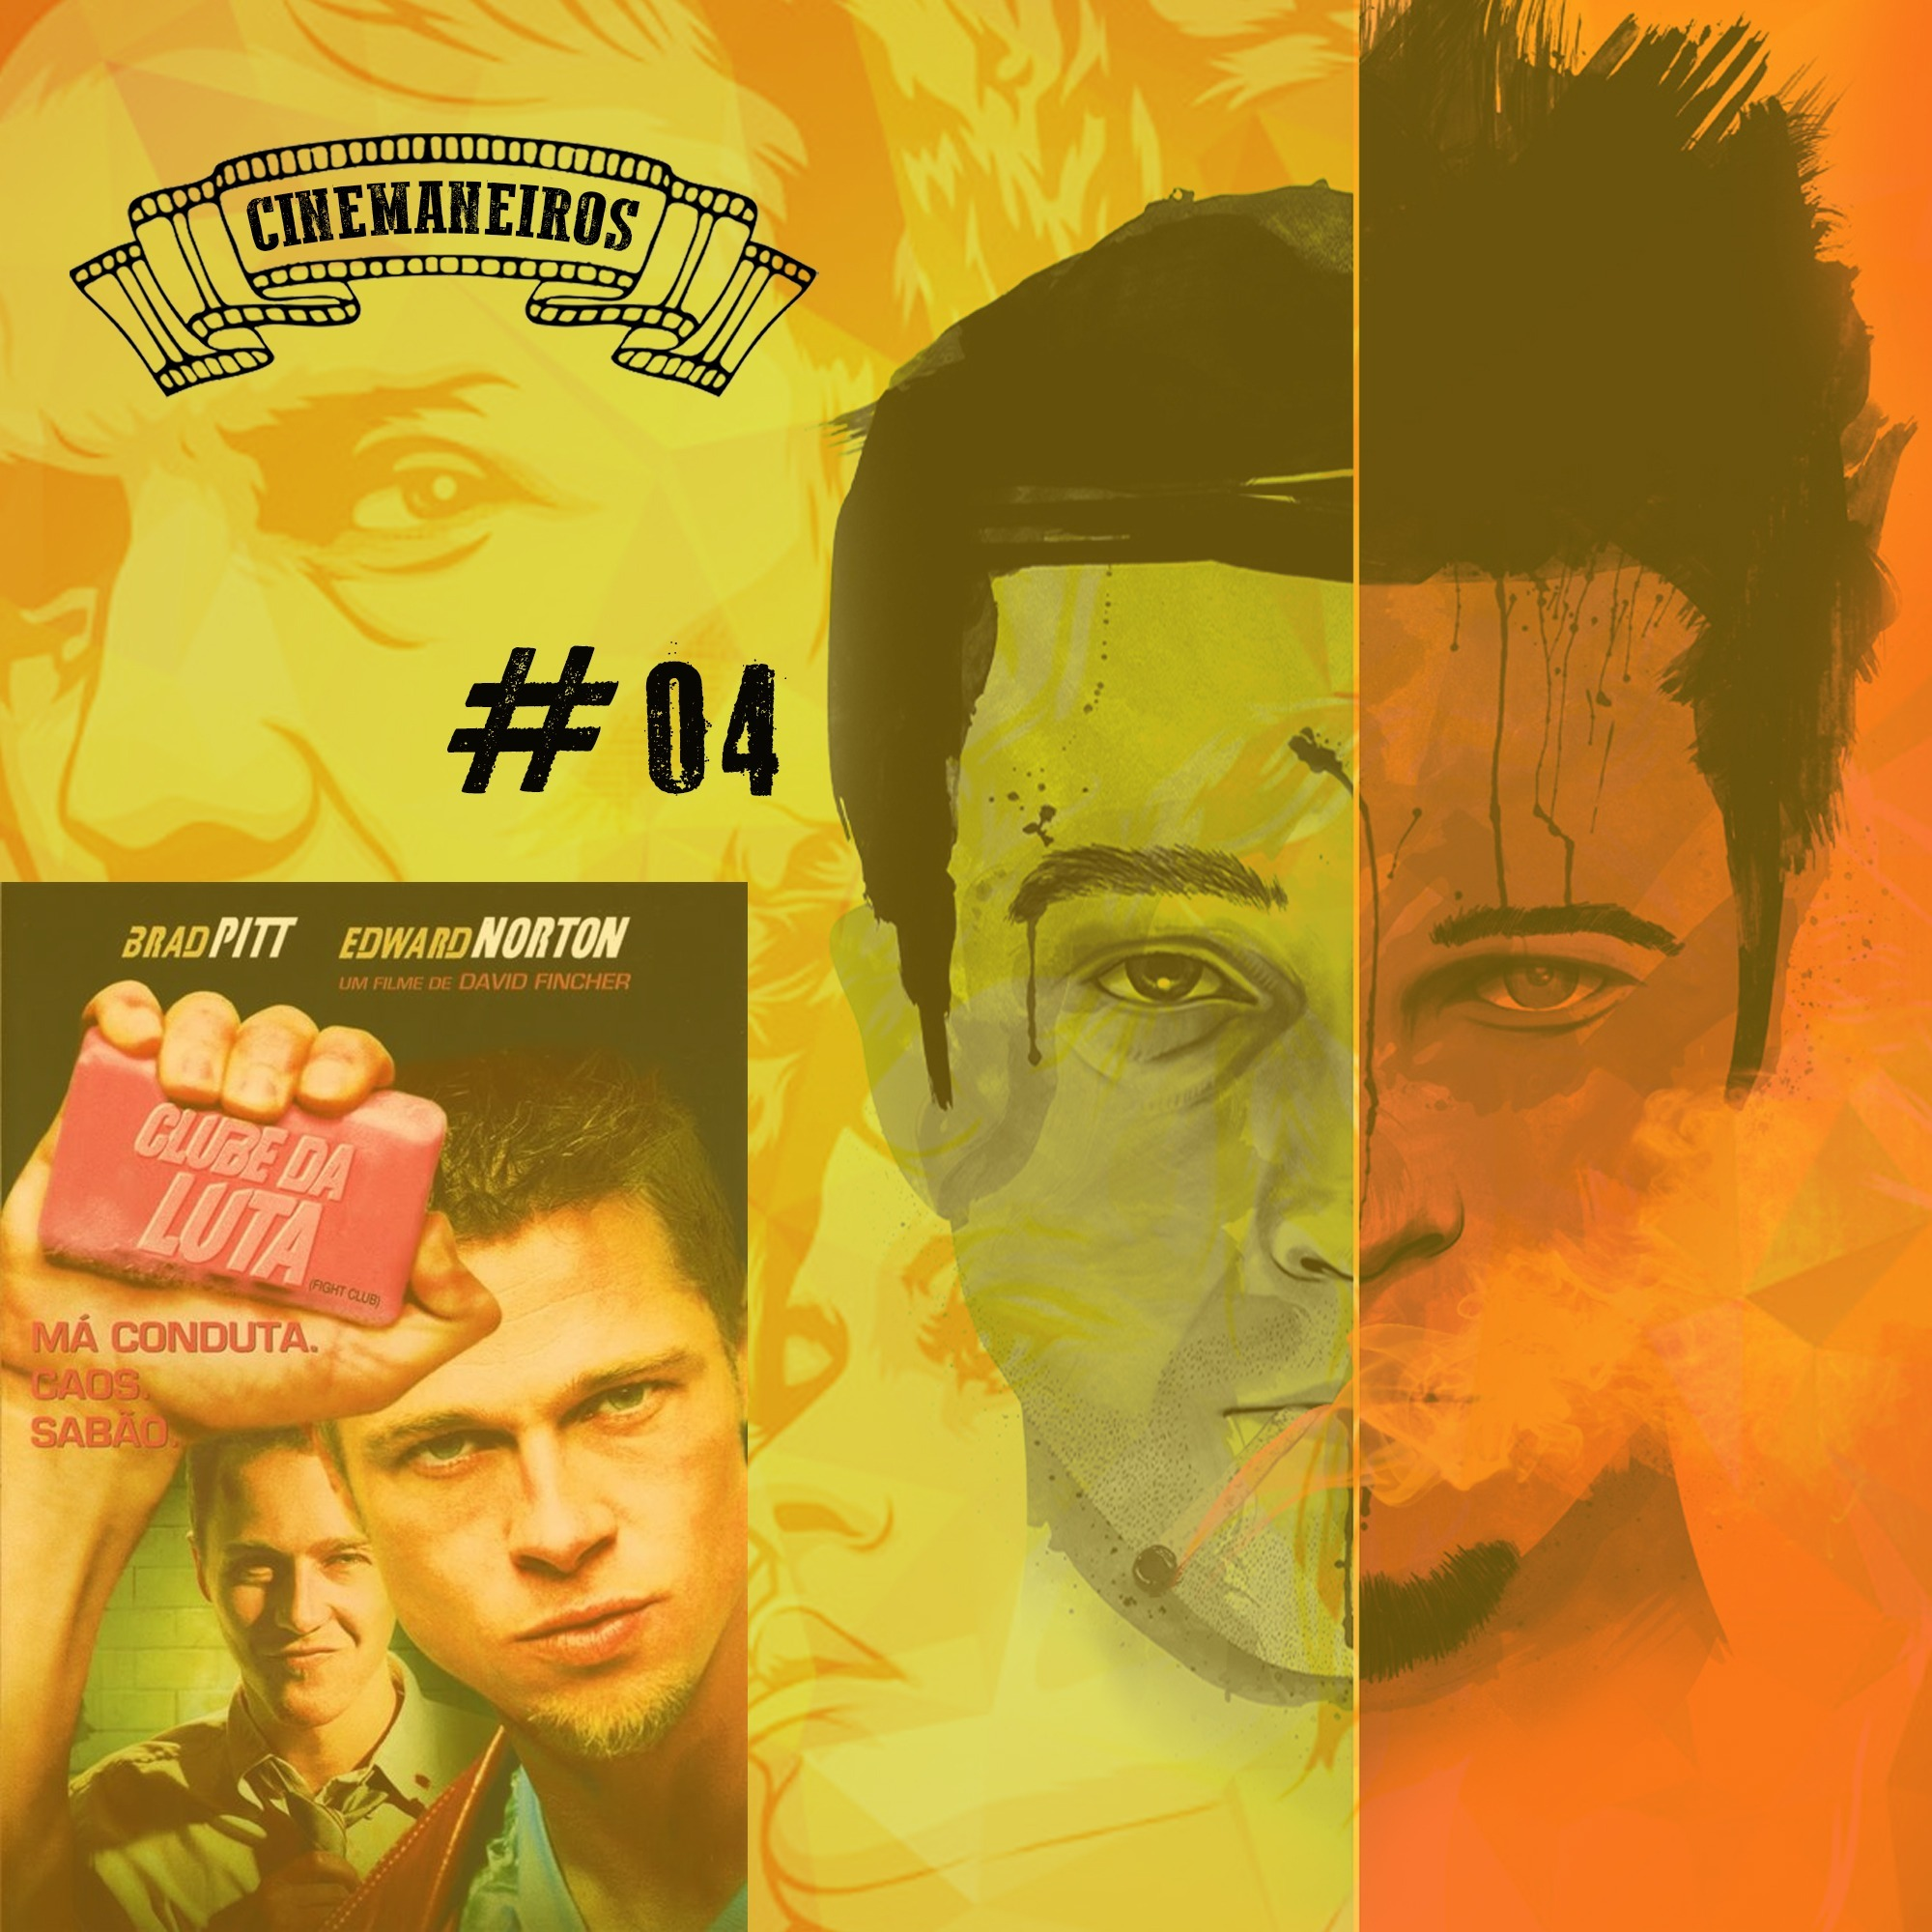 Cinemaneiros #04 Clube da Luta